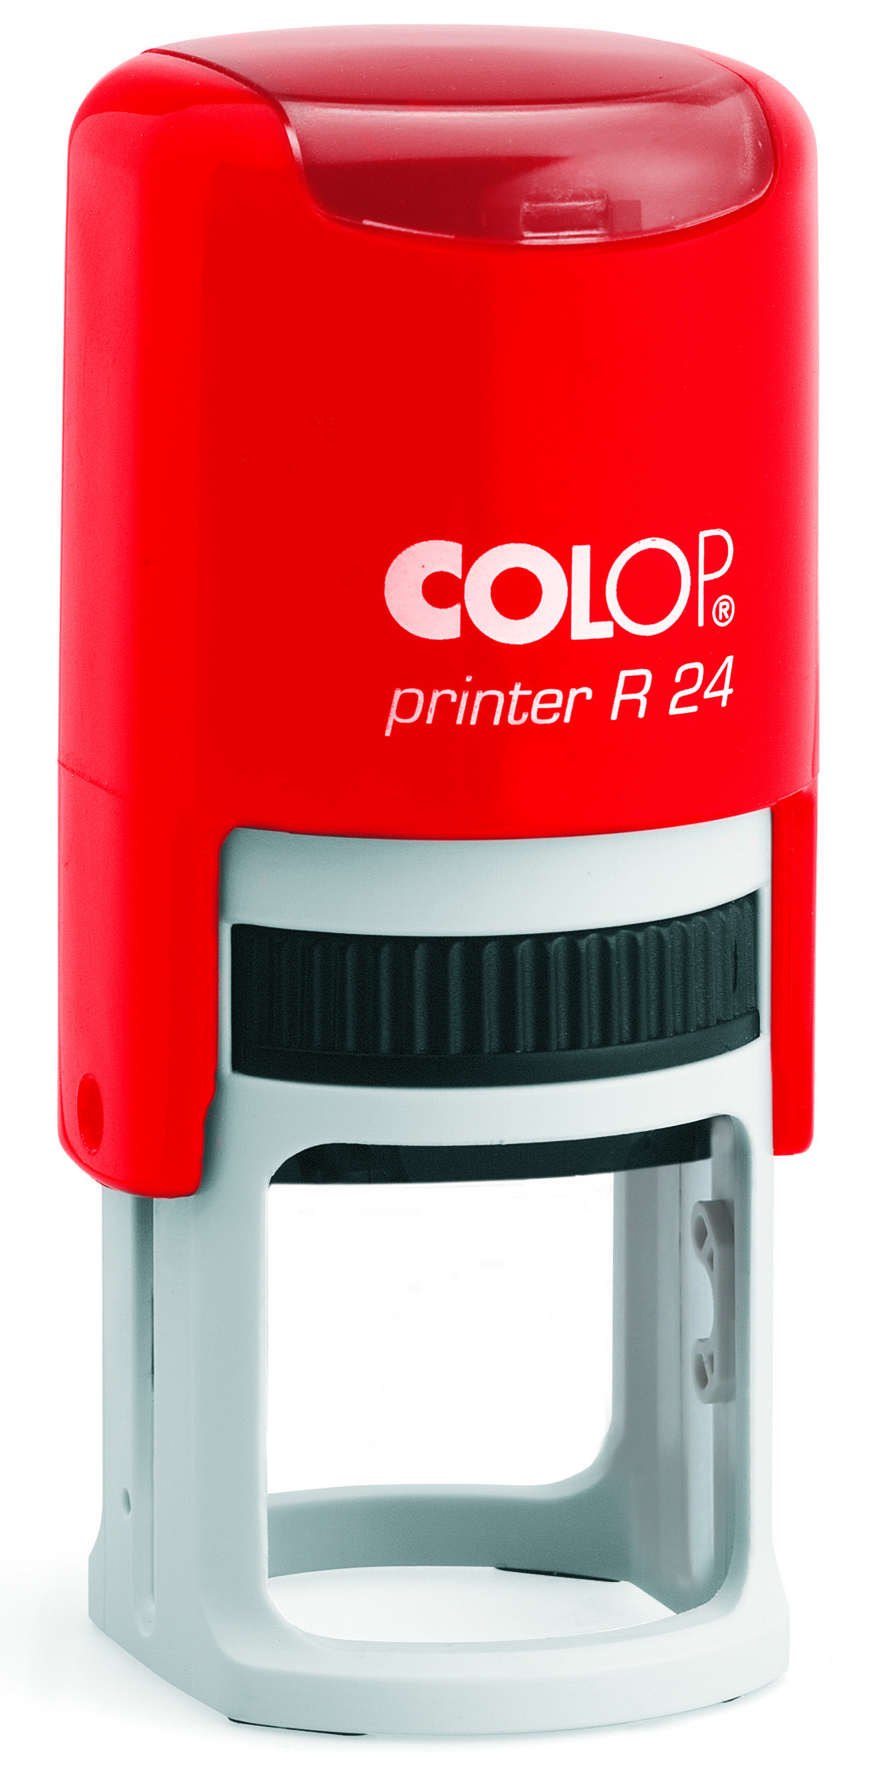 оснастка для круглой печати printer